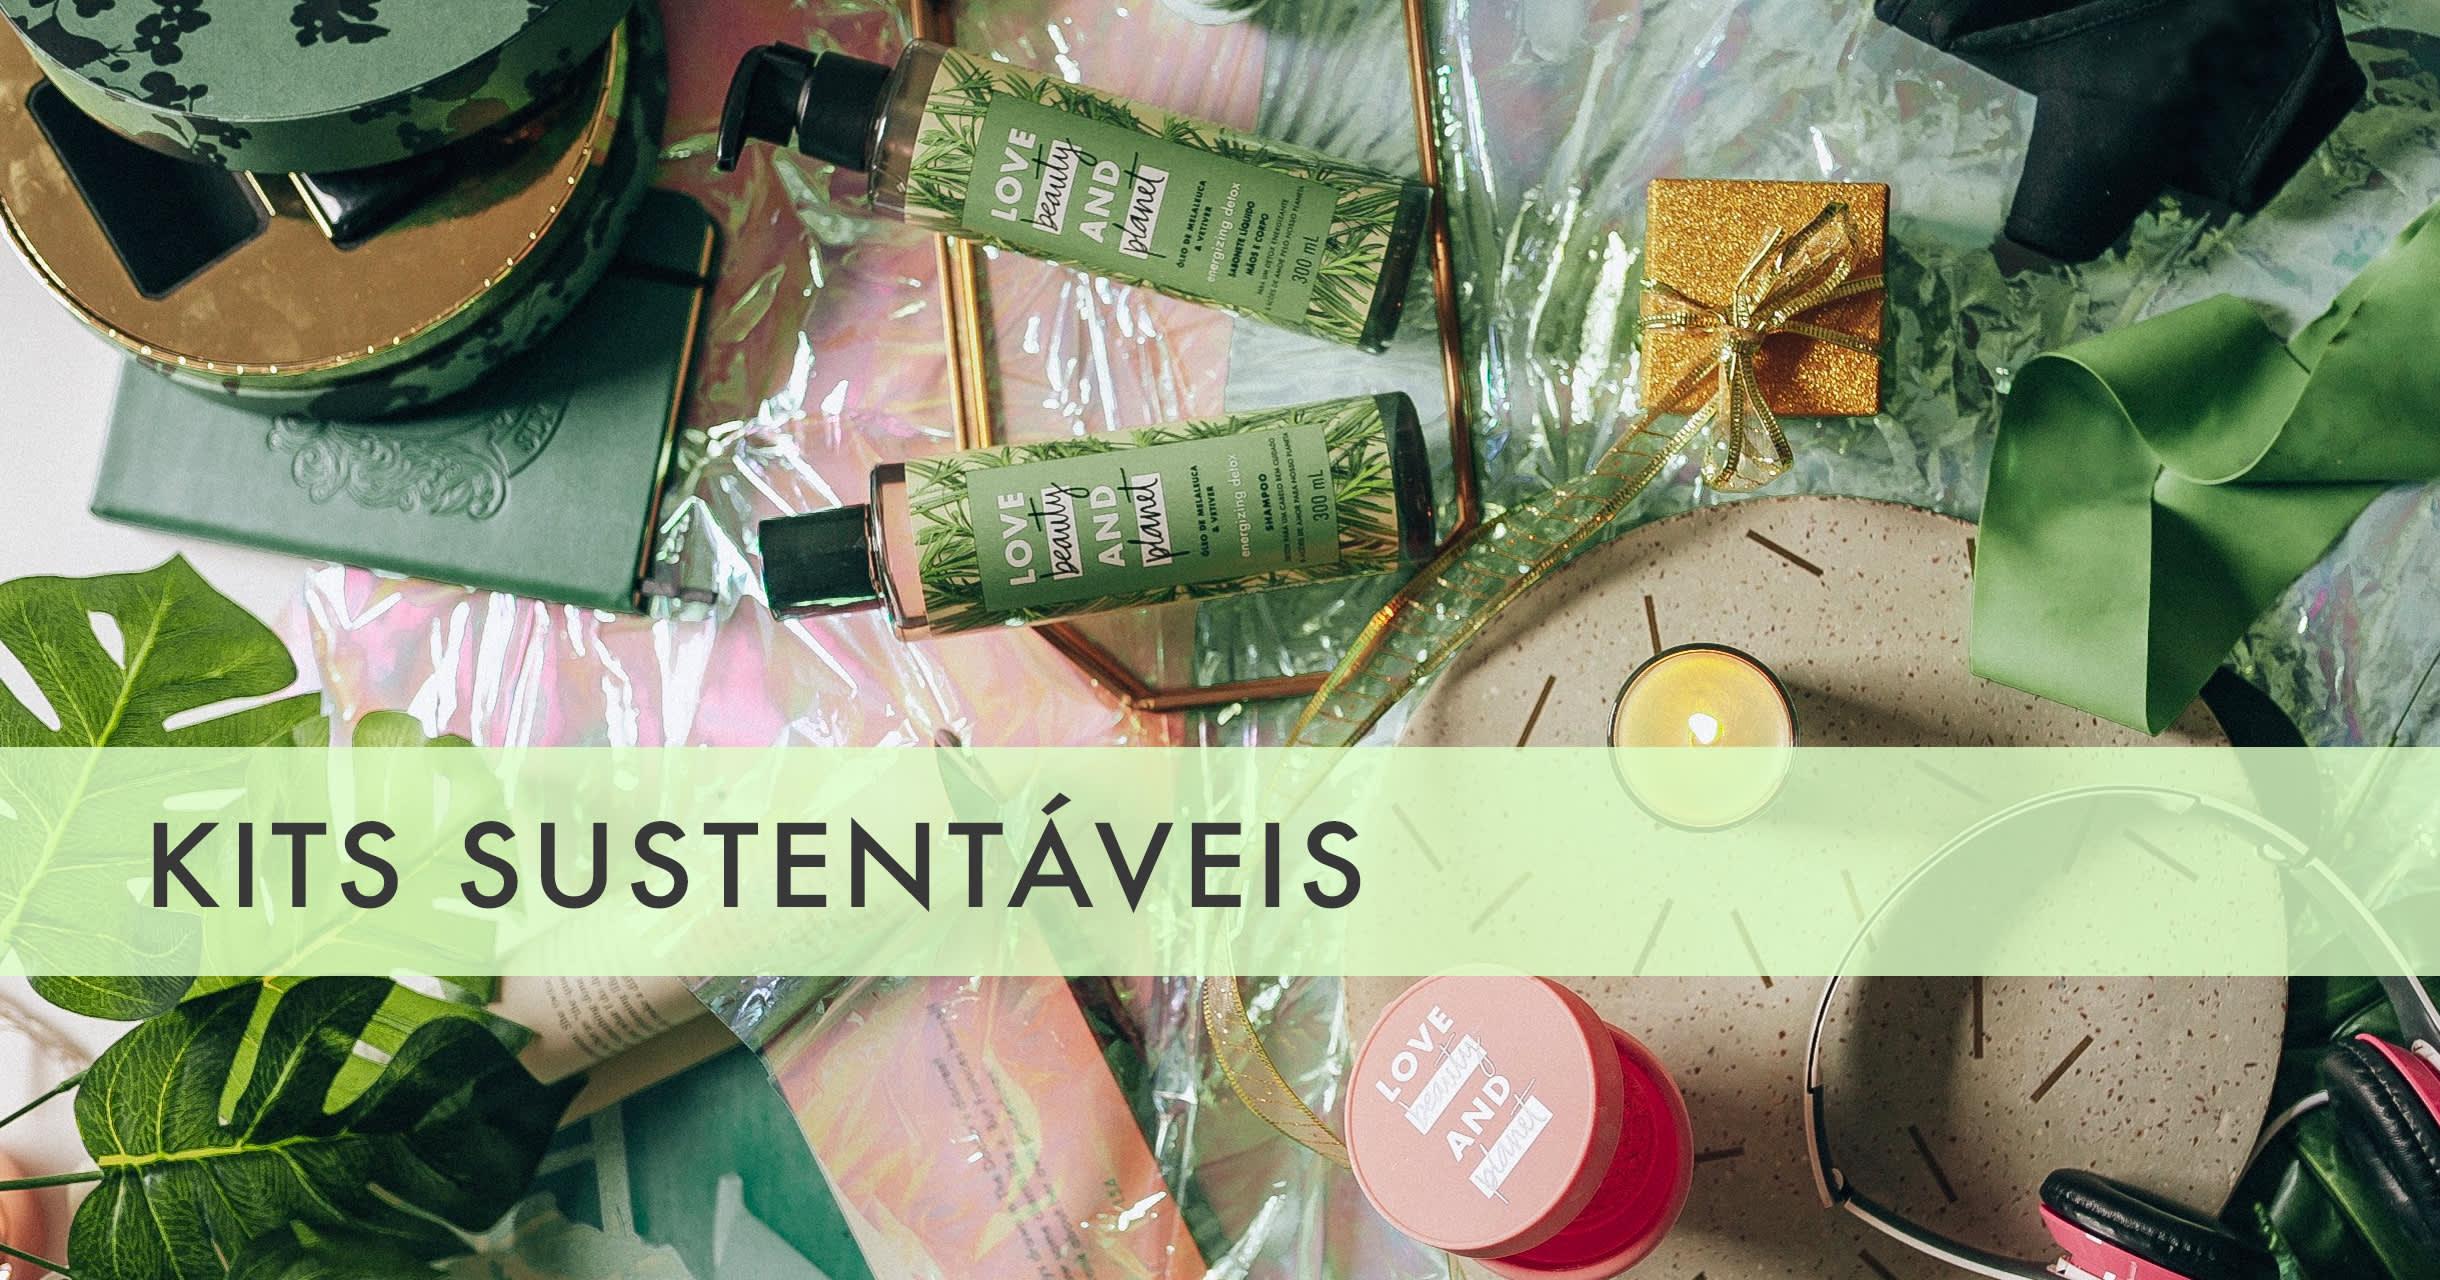 Banner Posição 3 - Kits Sustentáveis